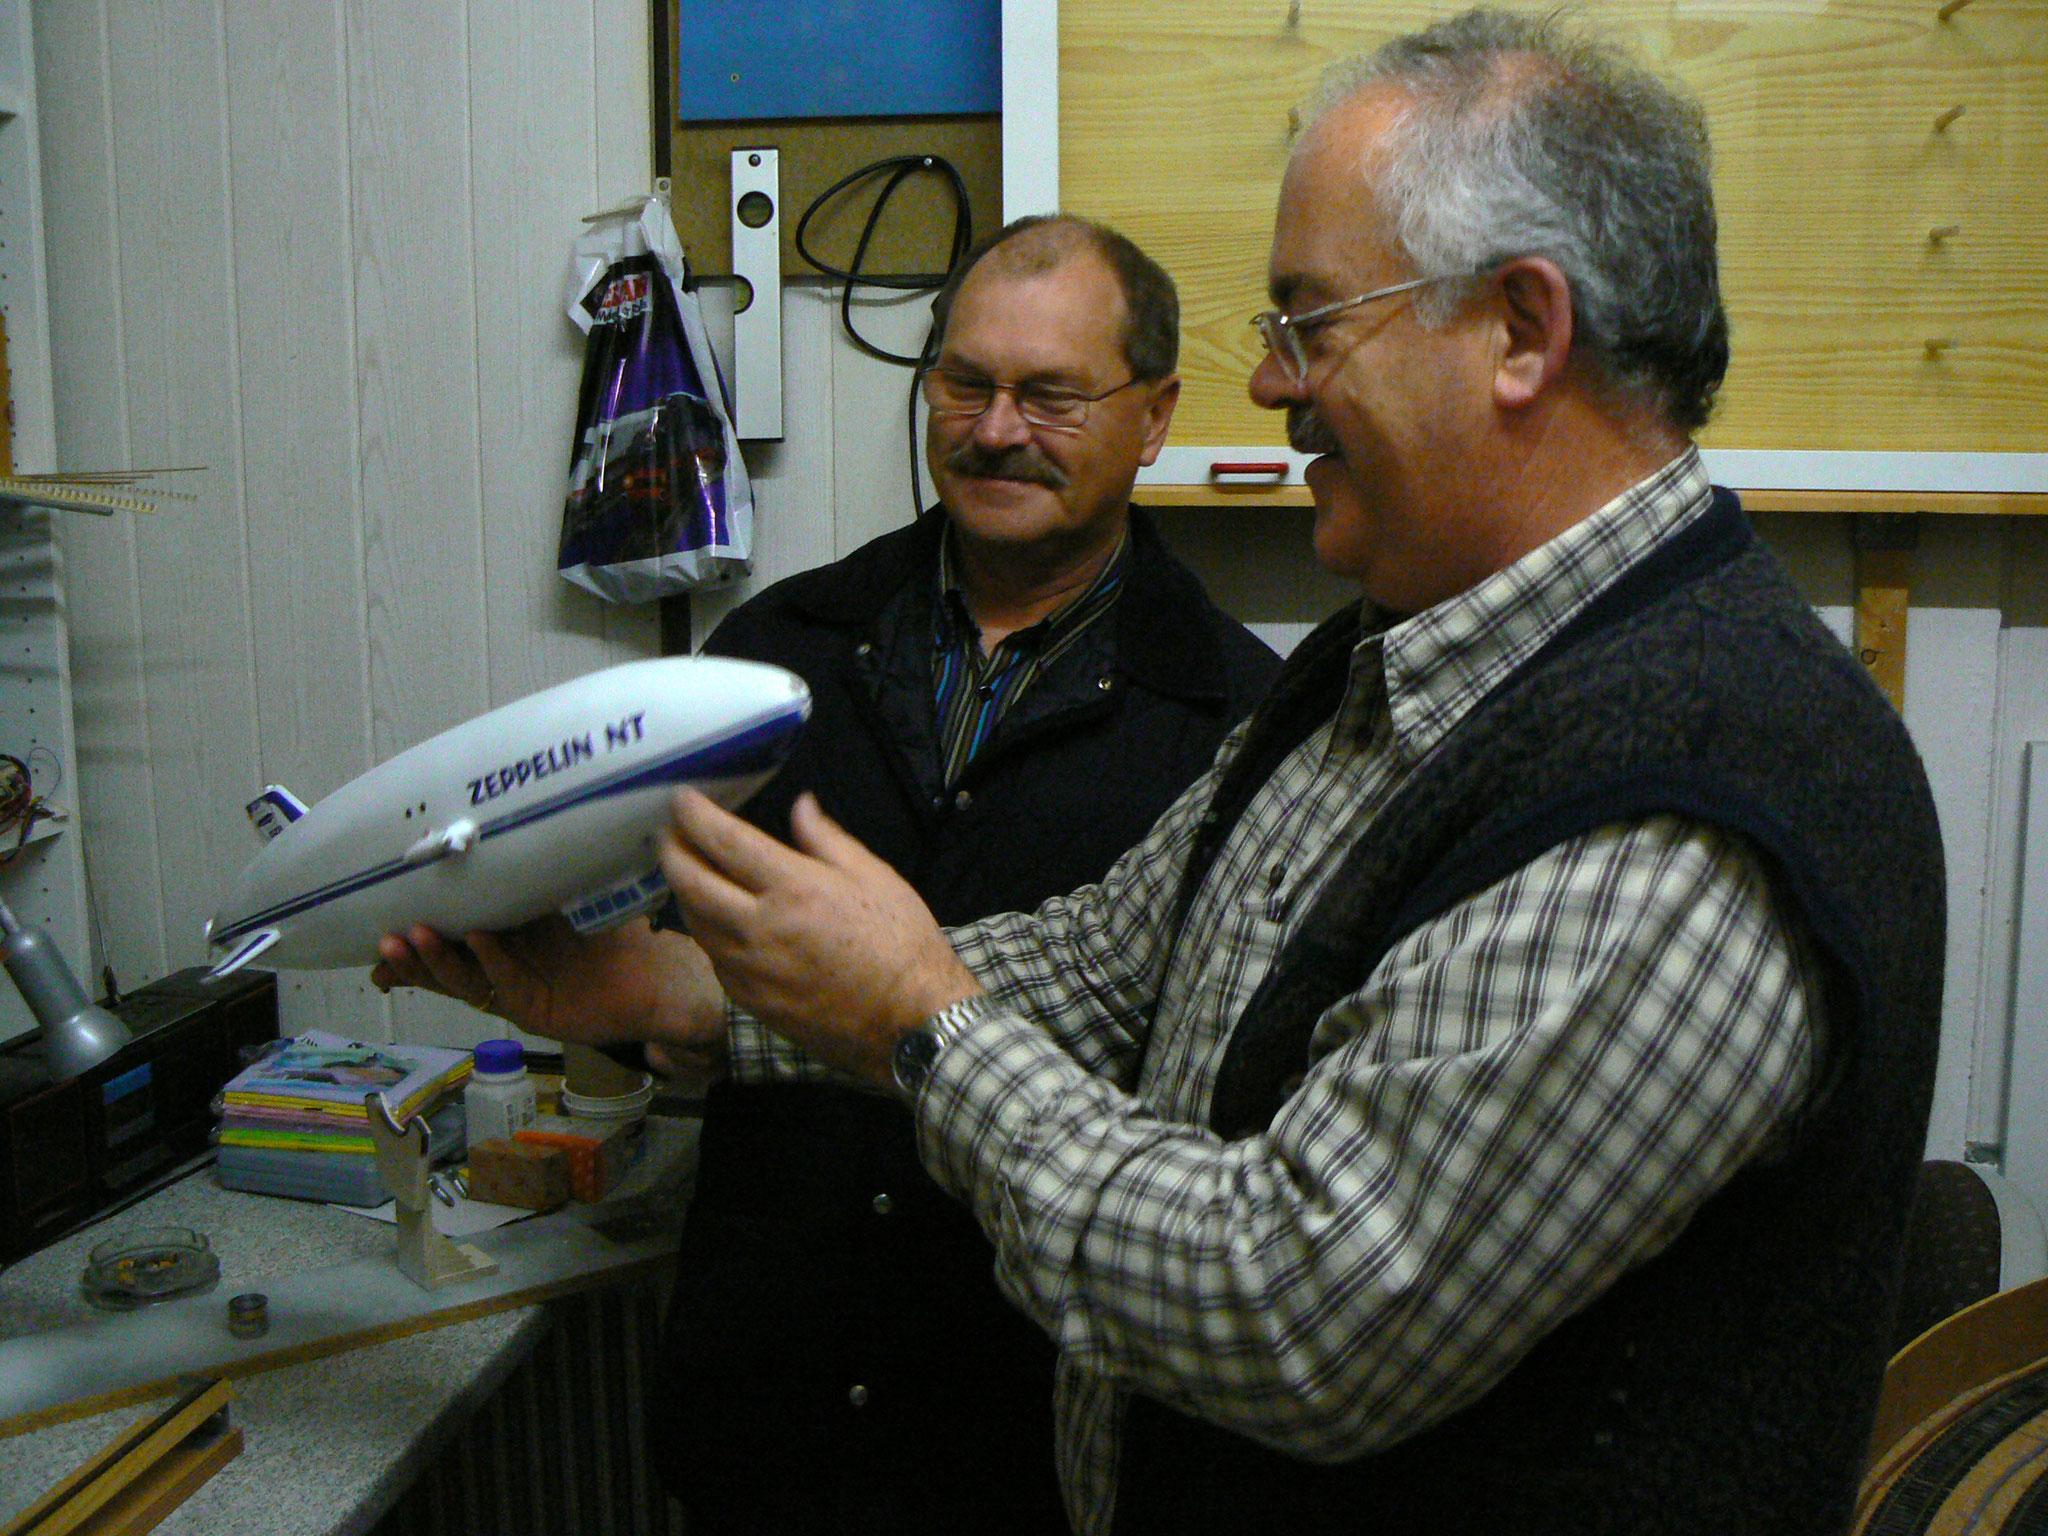 Gert und Franz bewundern den neuen Zeppelin NT (Okt. 2007)